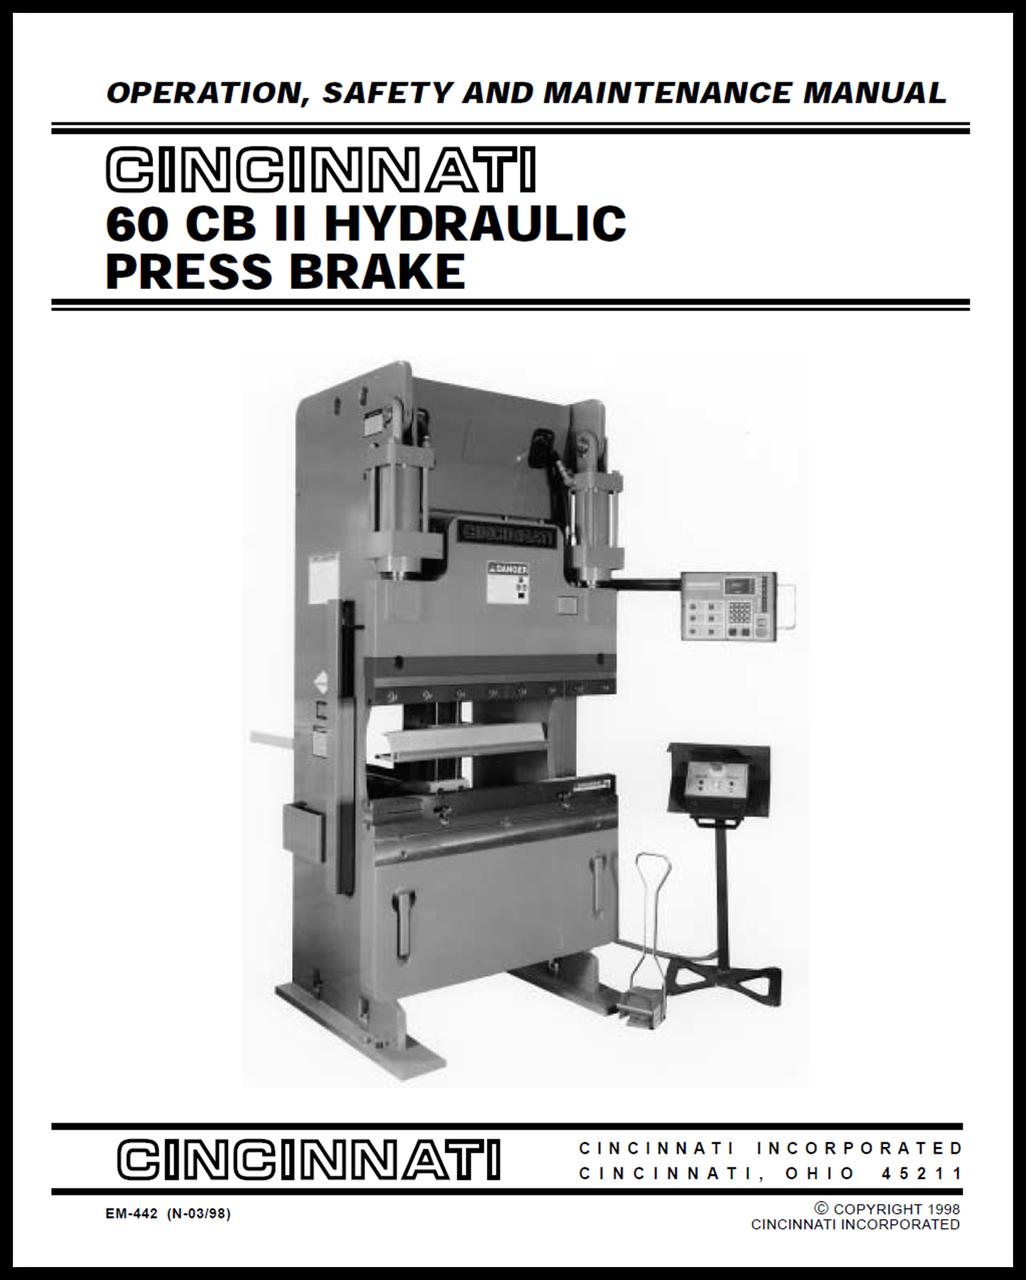 EM-442 (N-03-98) 60 CB II Hydraulic Press Brake - Operation, Safety and Maintenance Manual